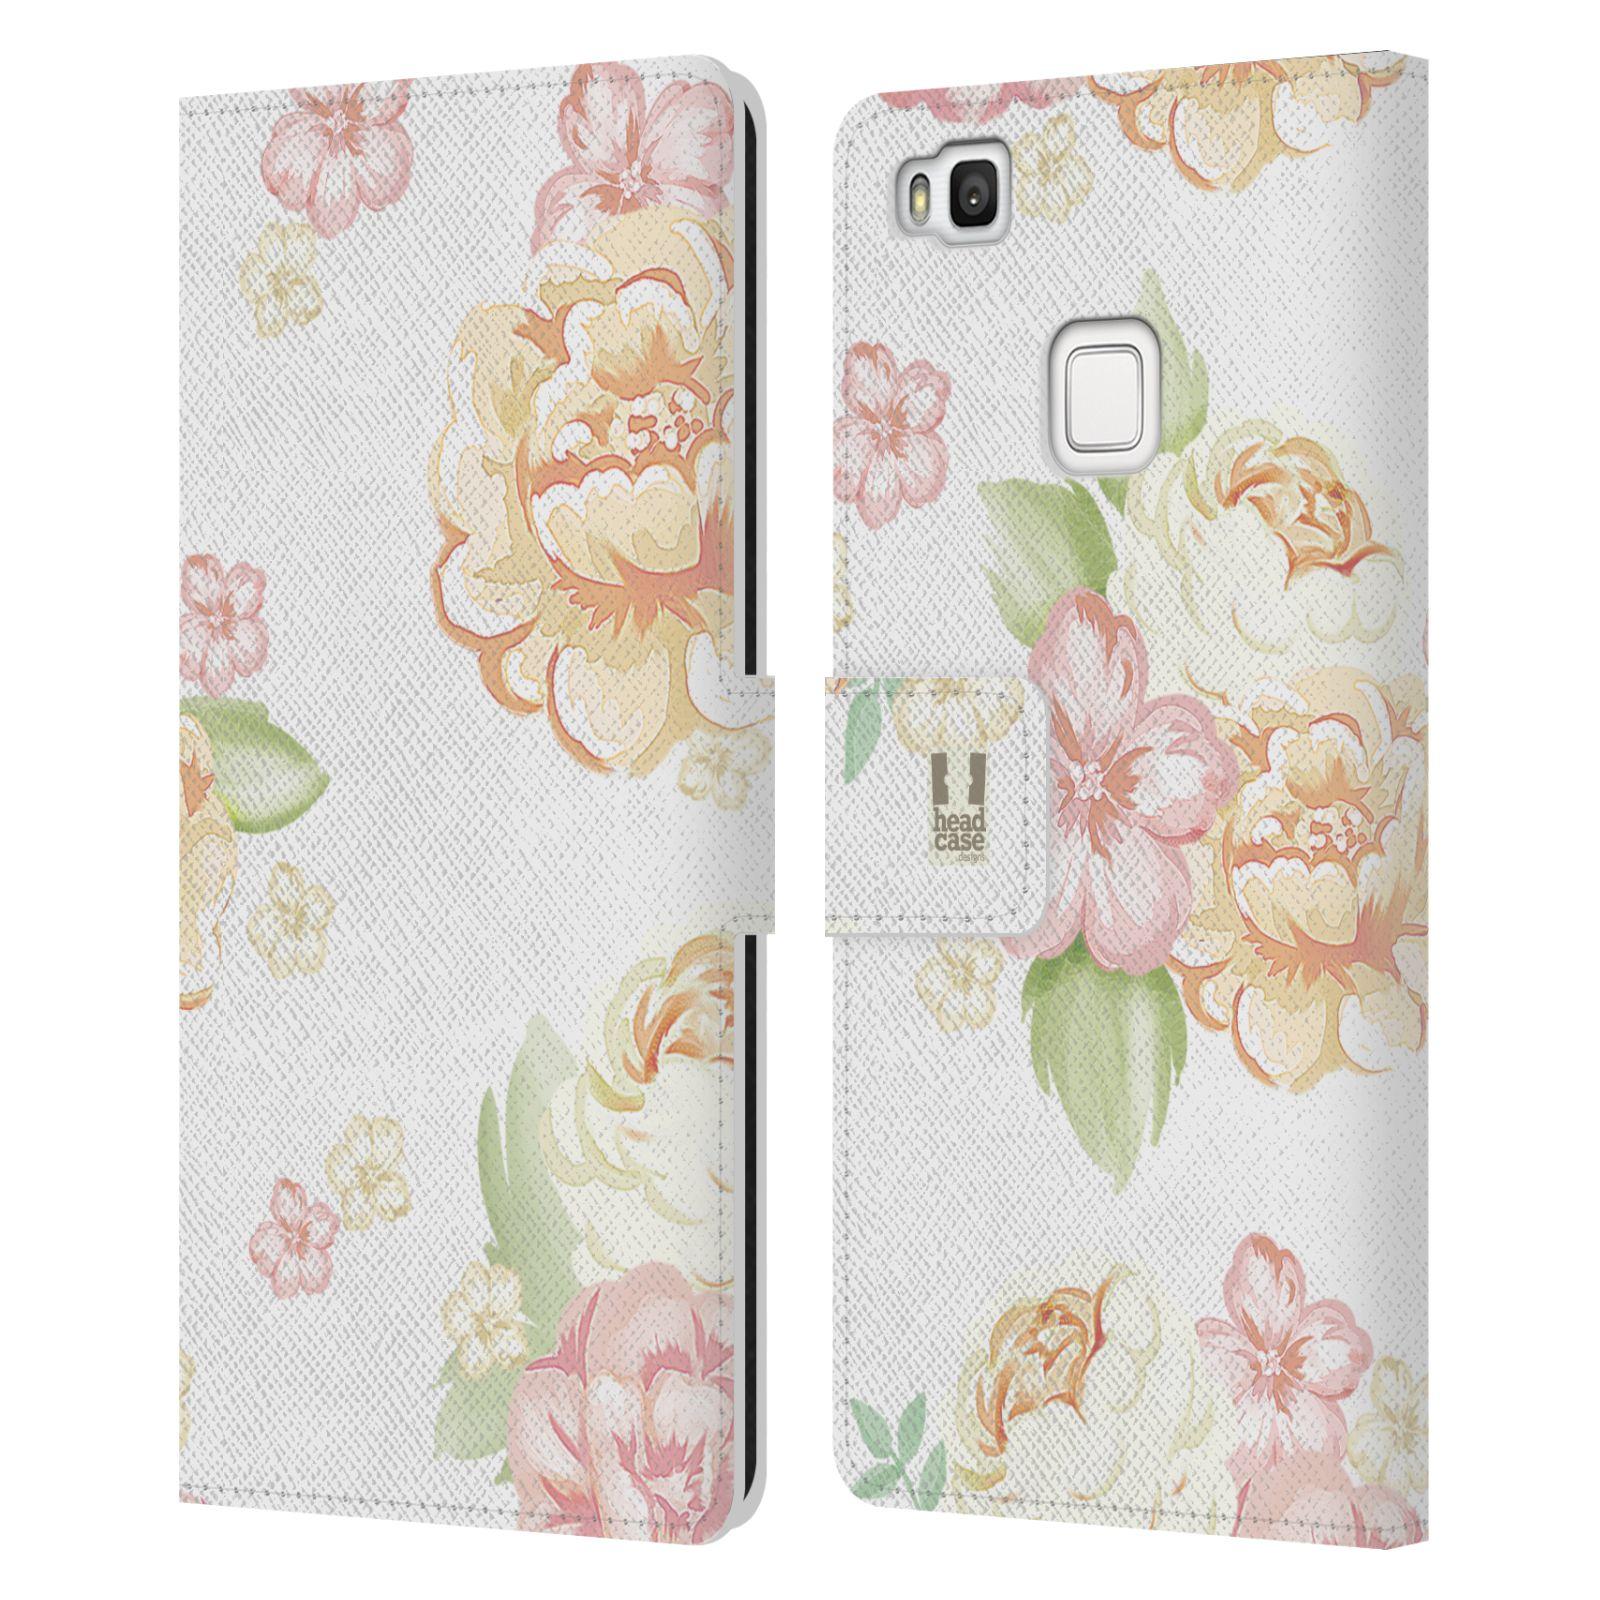 HEAD CASE Flipové pouzdro pro mobil Huawei P9 LITE Francouzský venkov květ bílá